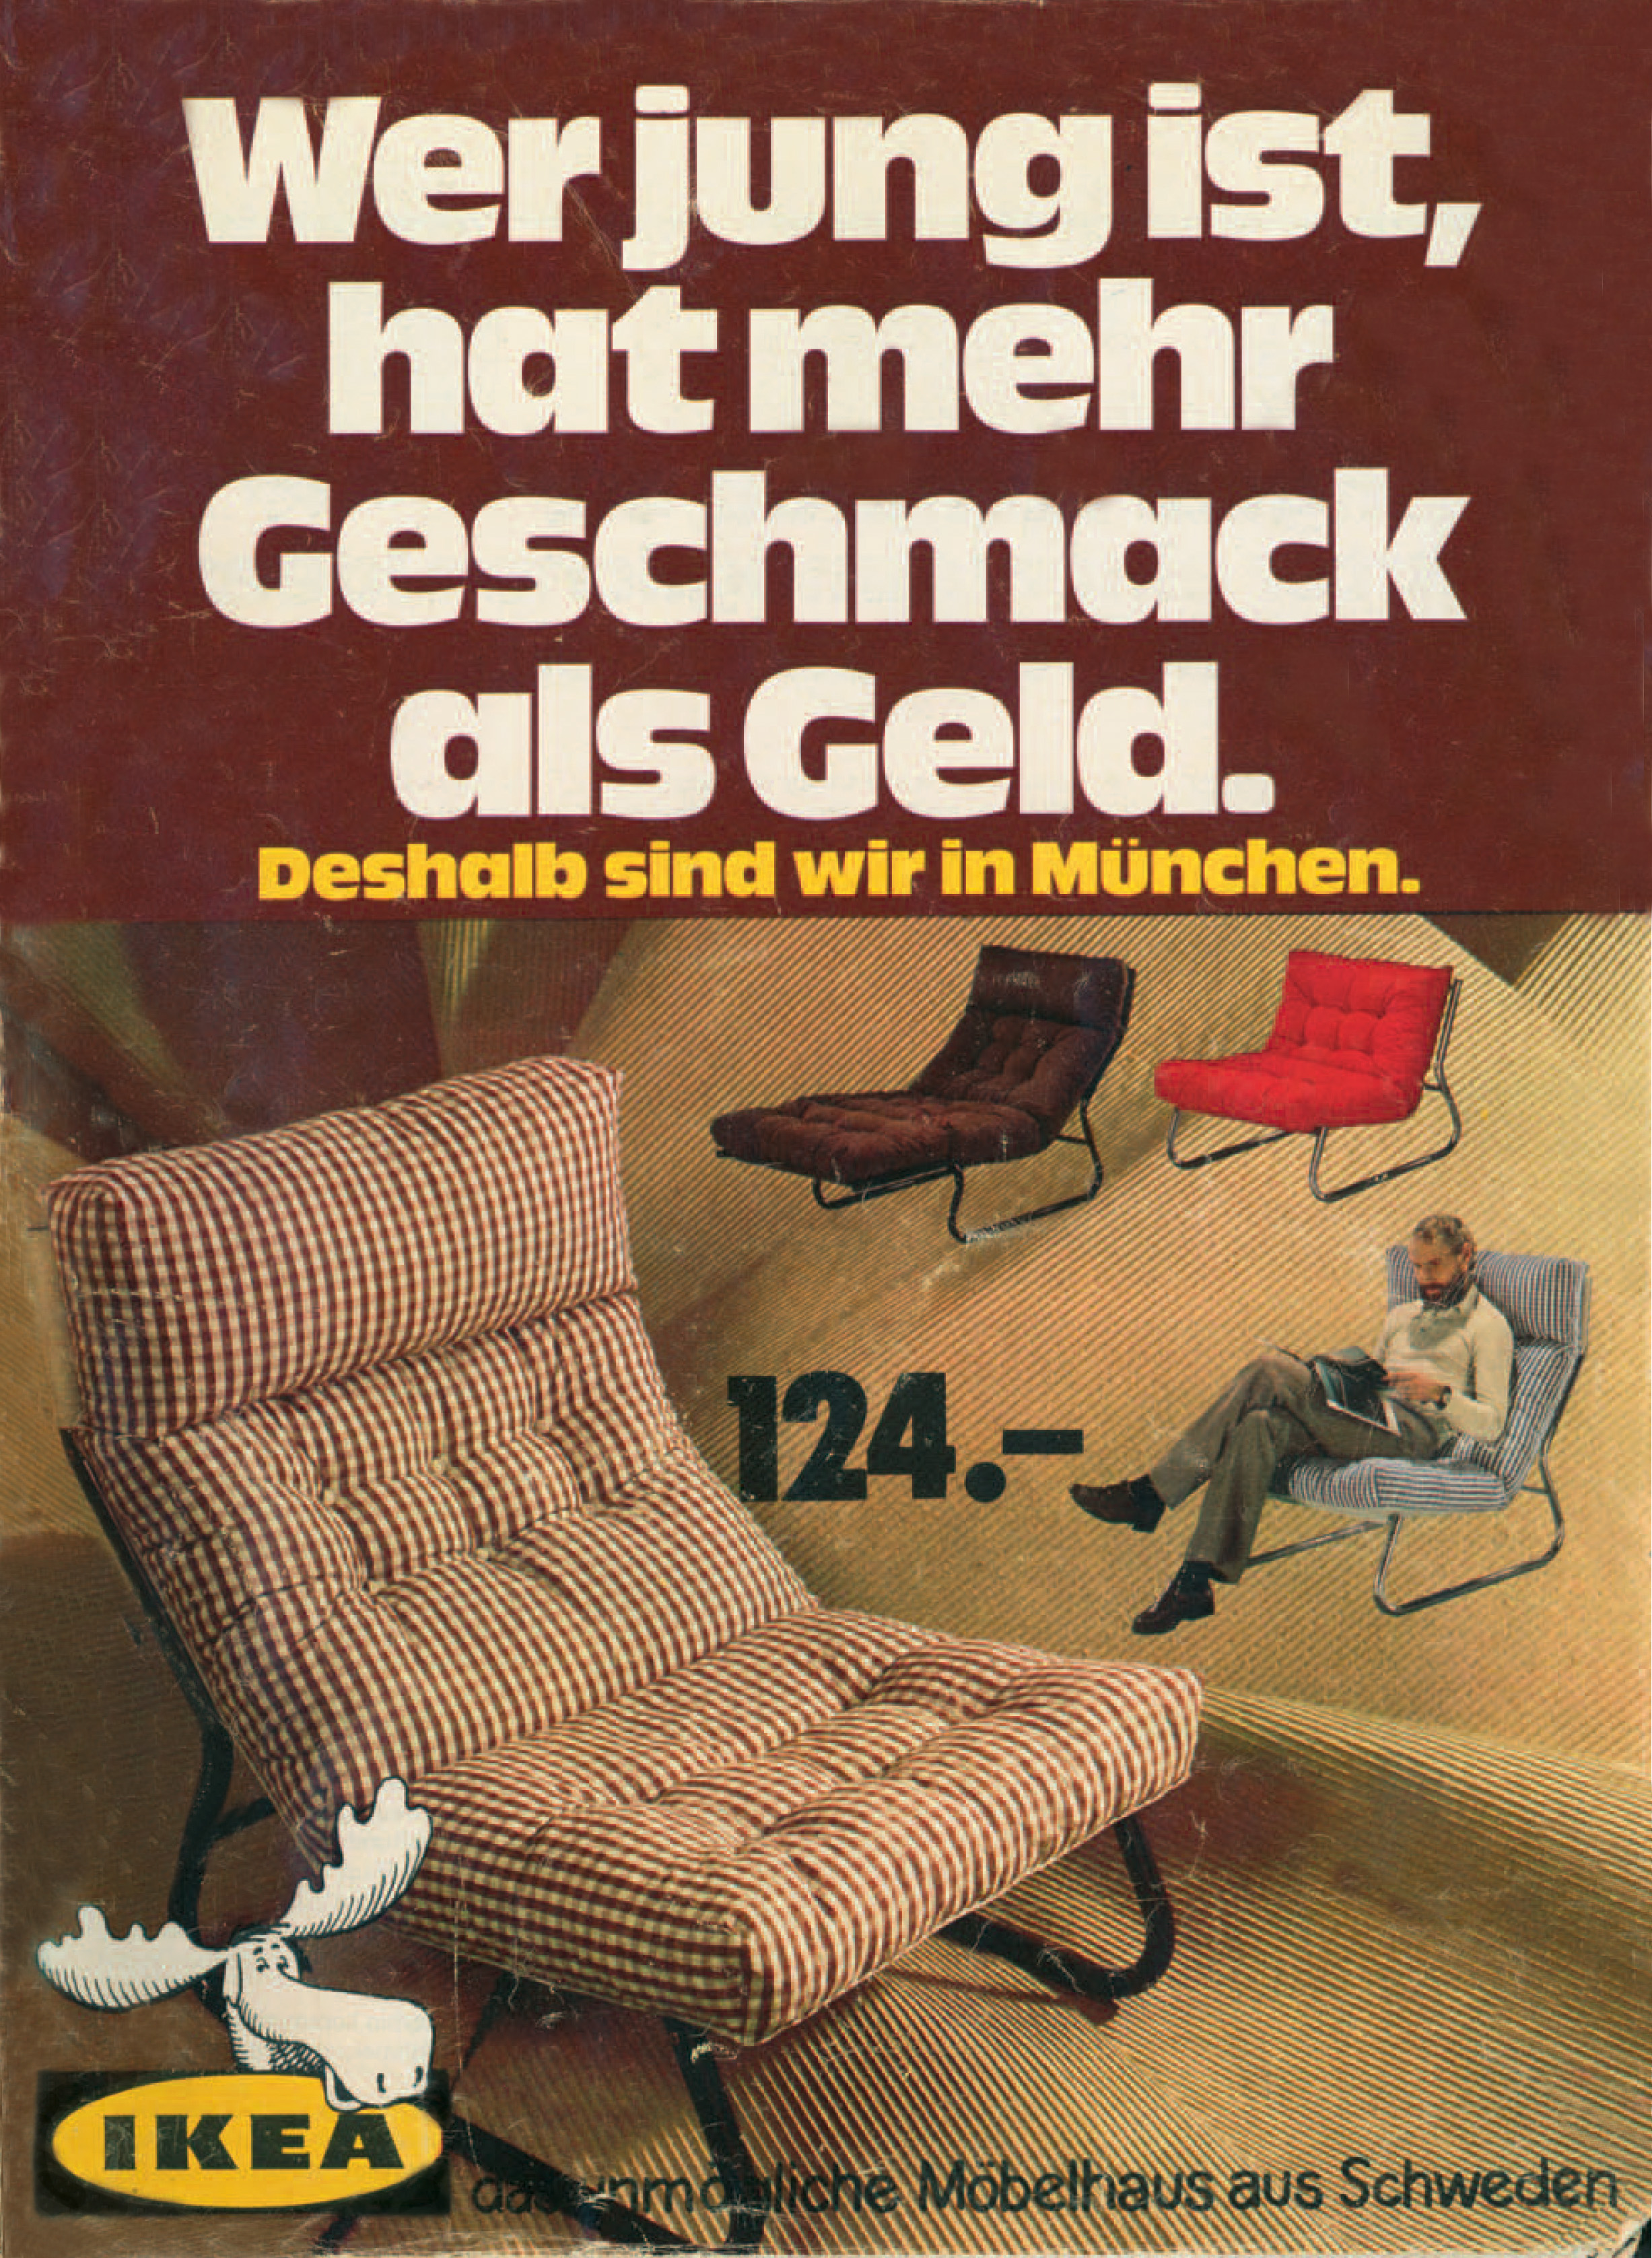 40 jahre ikea deutschland presseportal. Black Bedroom Furniture Sets. Home Design Ideas